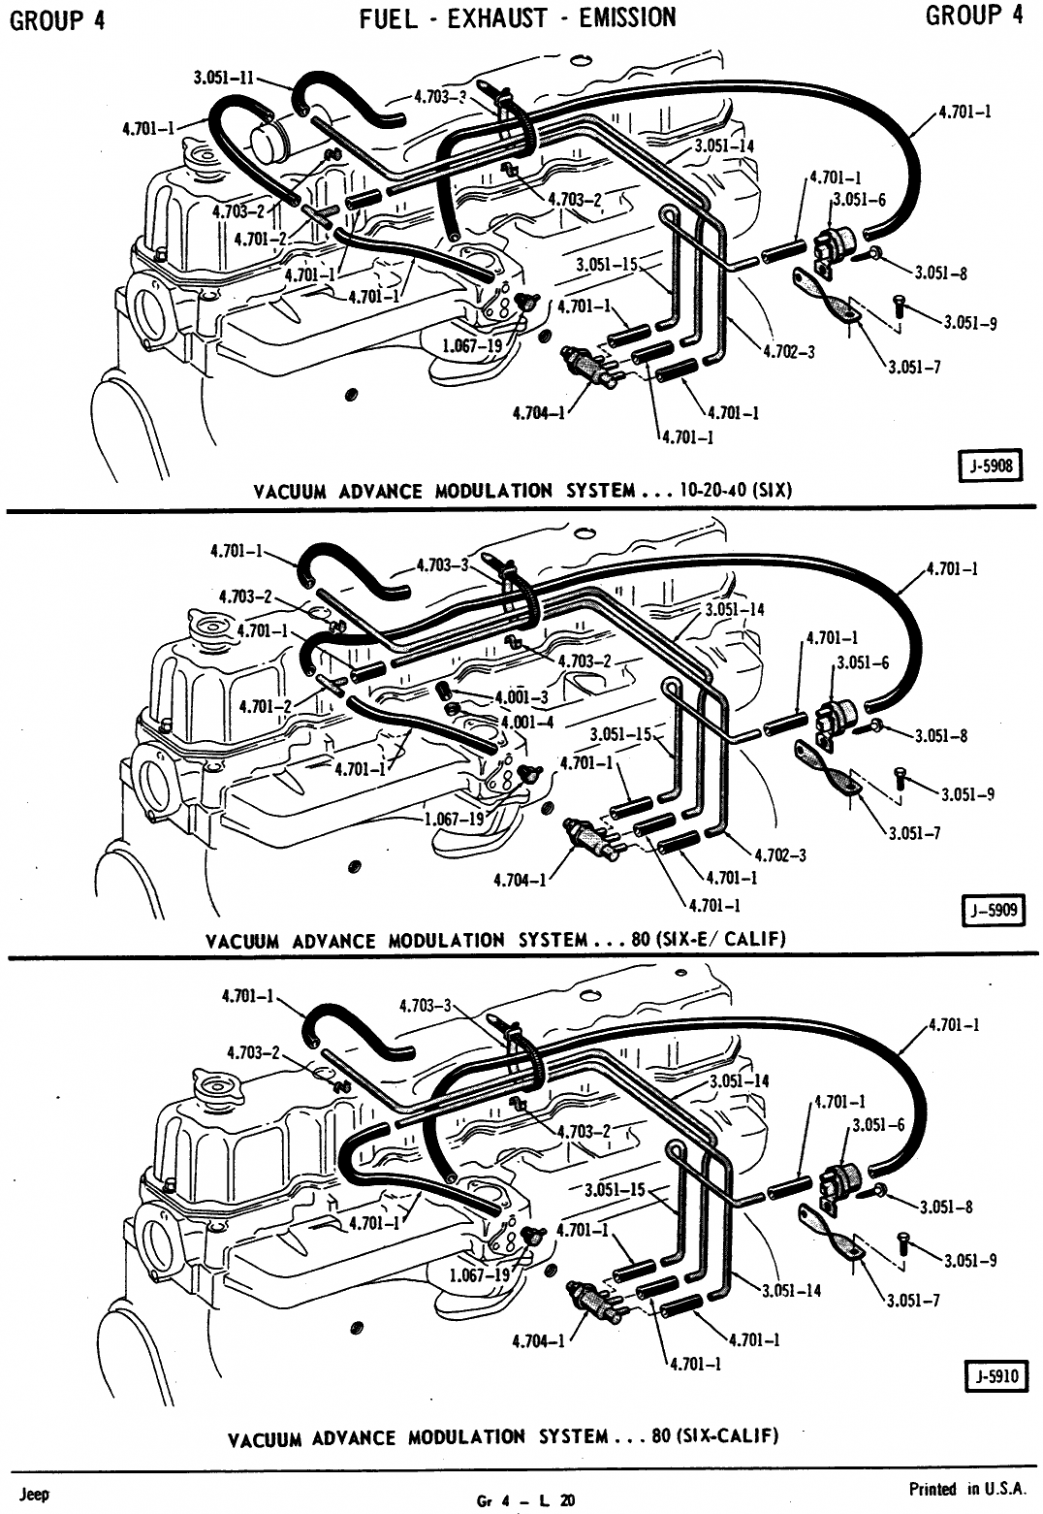 Amc 5 Engine Diagram Pdf Amc 5 Engine Diagram Pdf amc